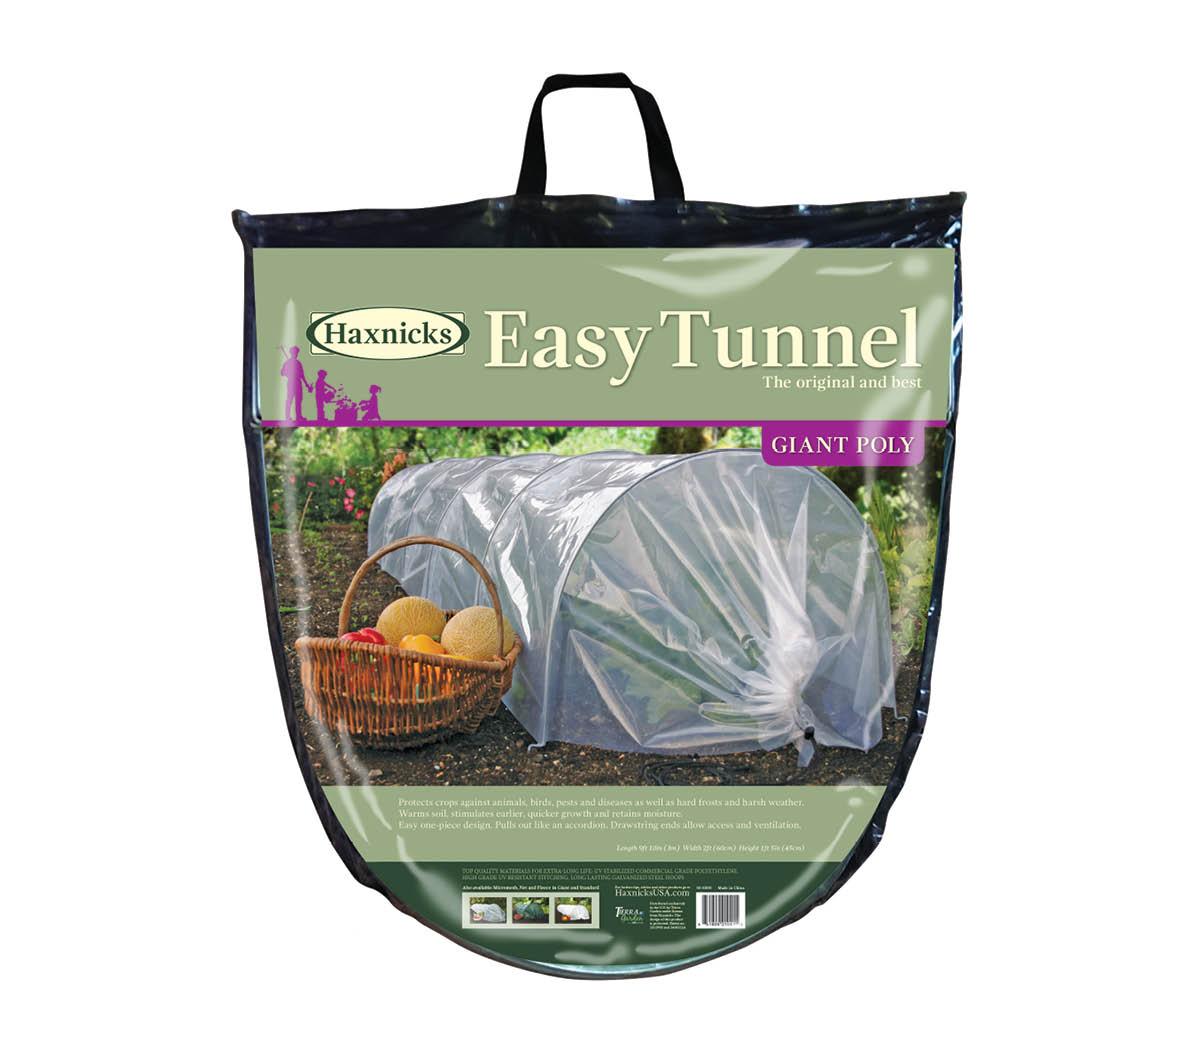 Haxnicks Giant Poly Easy Tunnel.jpg